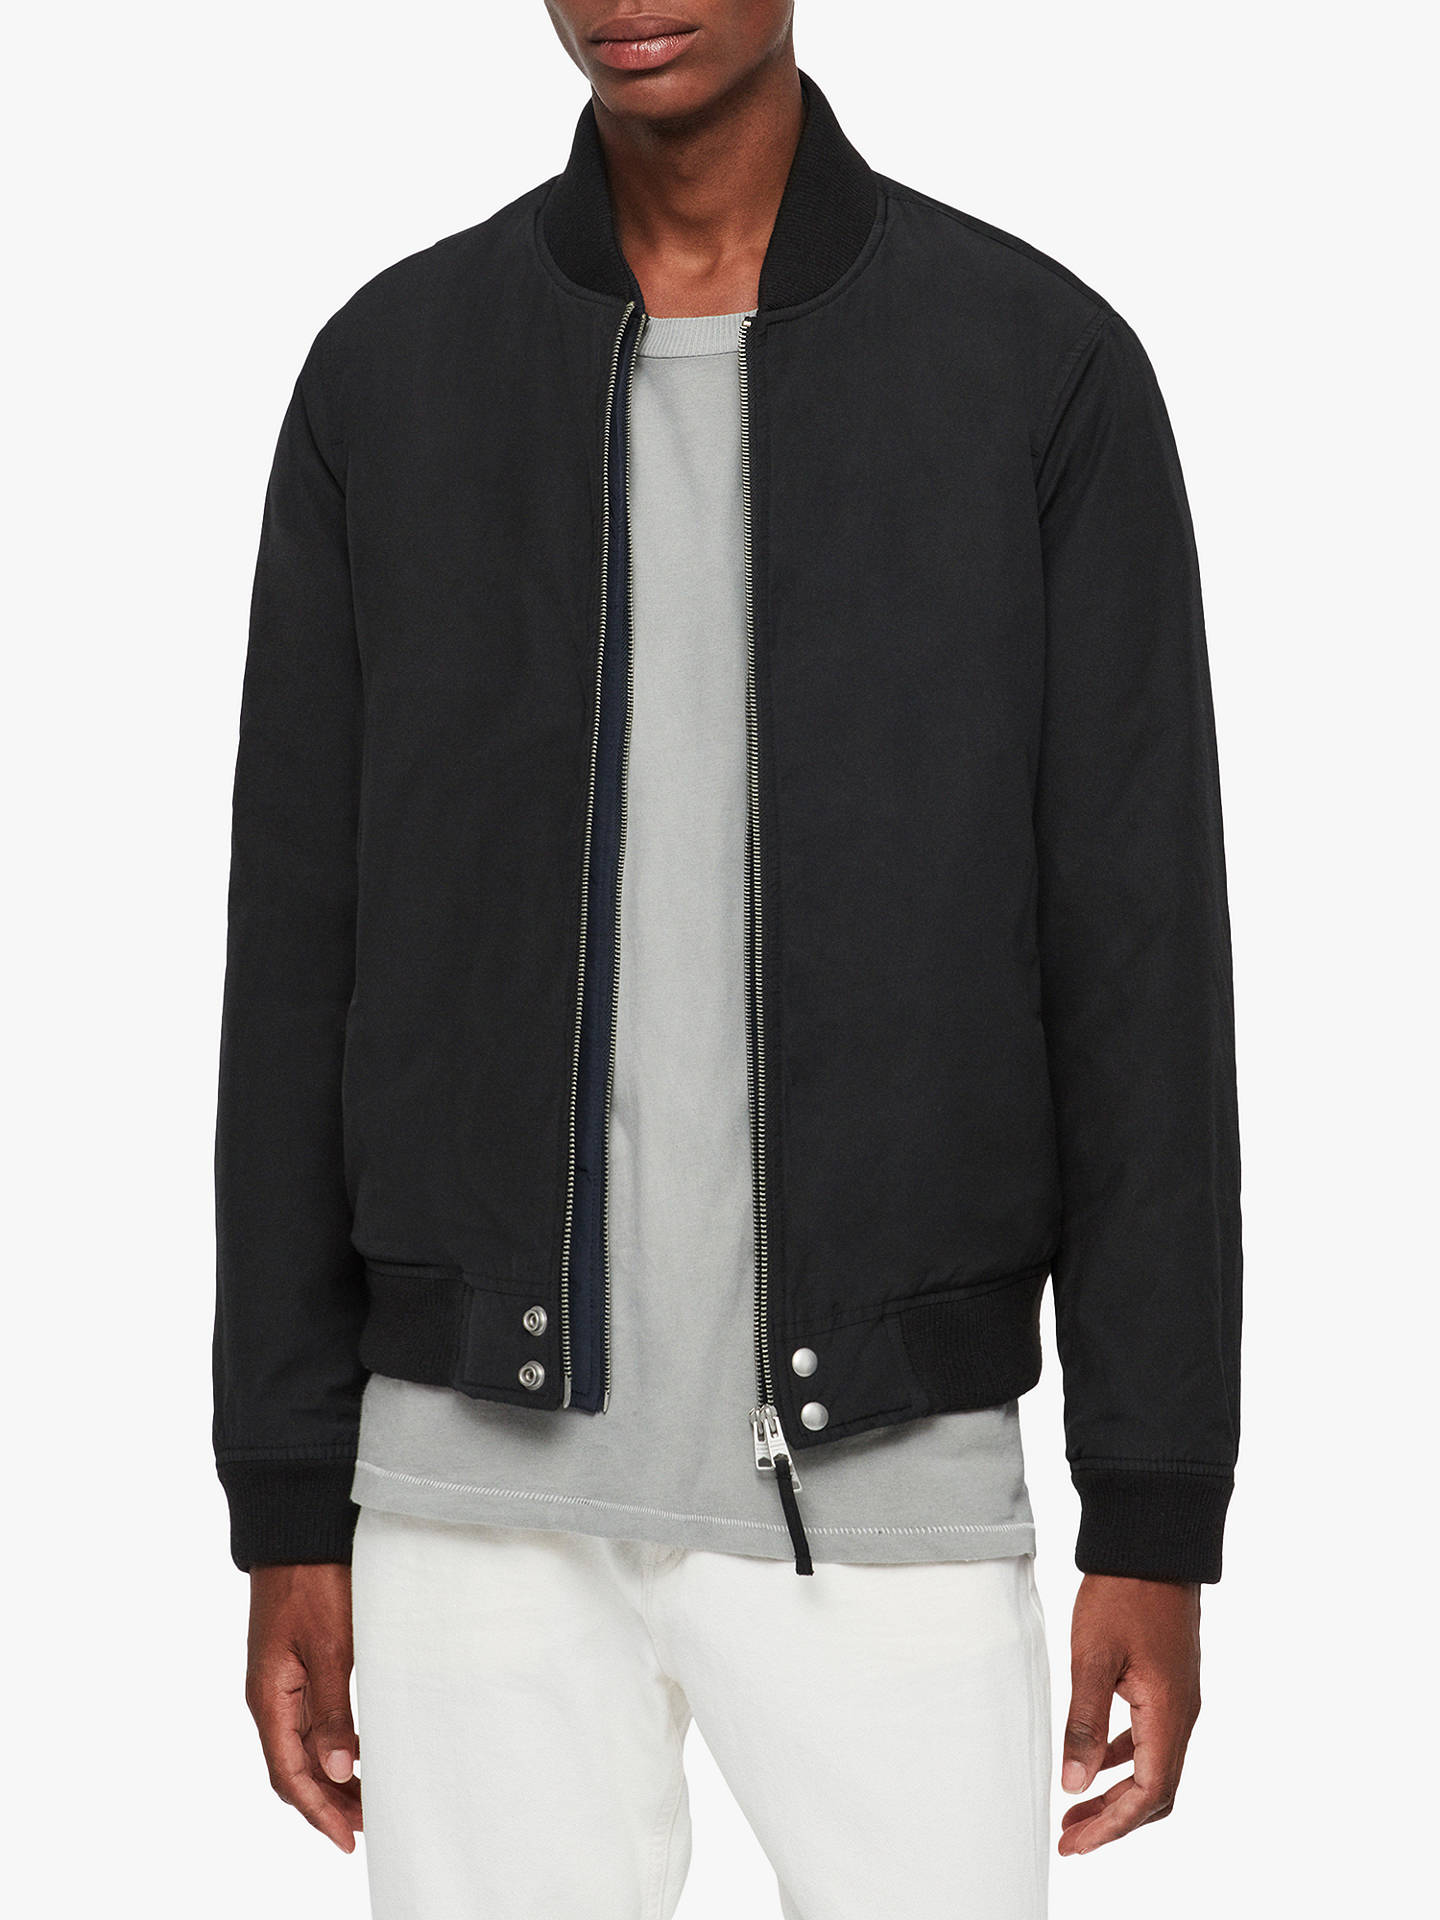 AllSaints Black Cotton Outer Shell